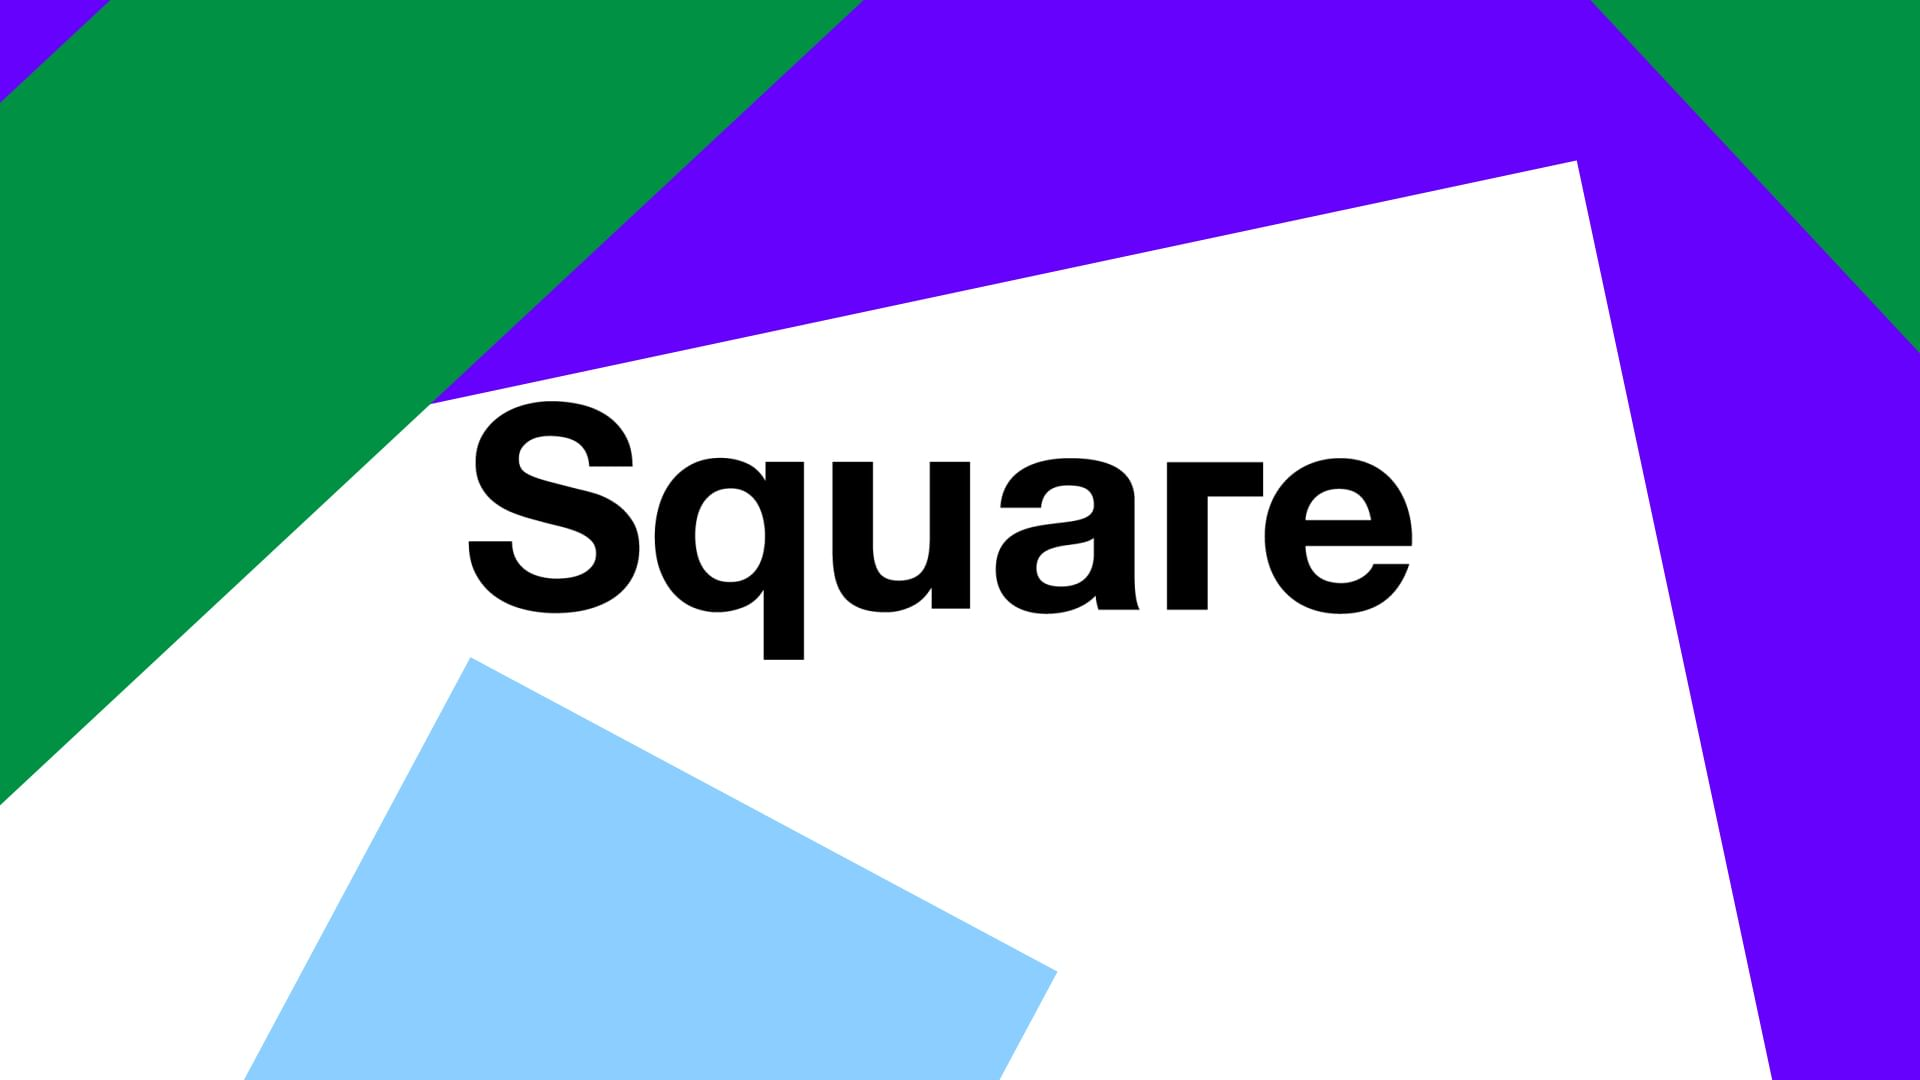 Square: Agora idei, agora artystyczna